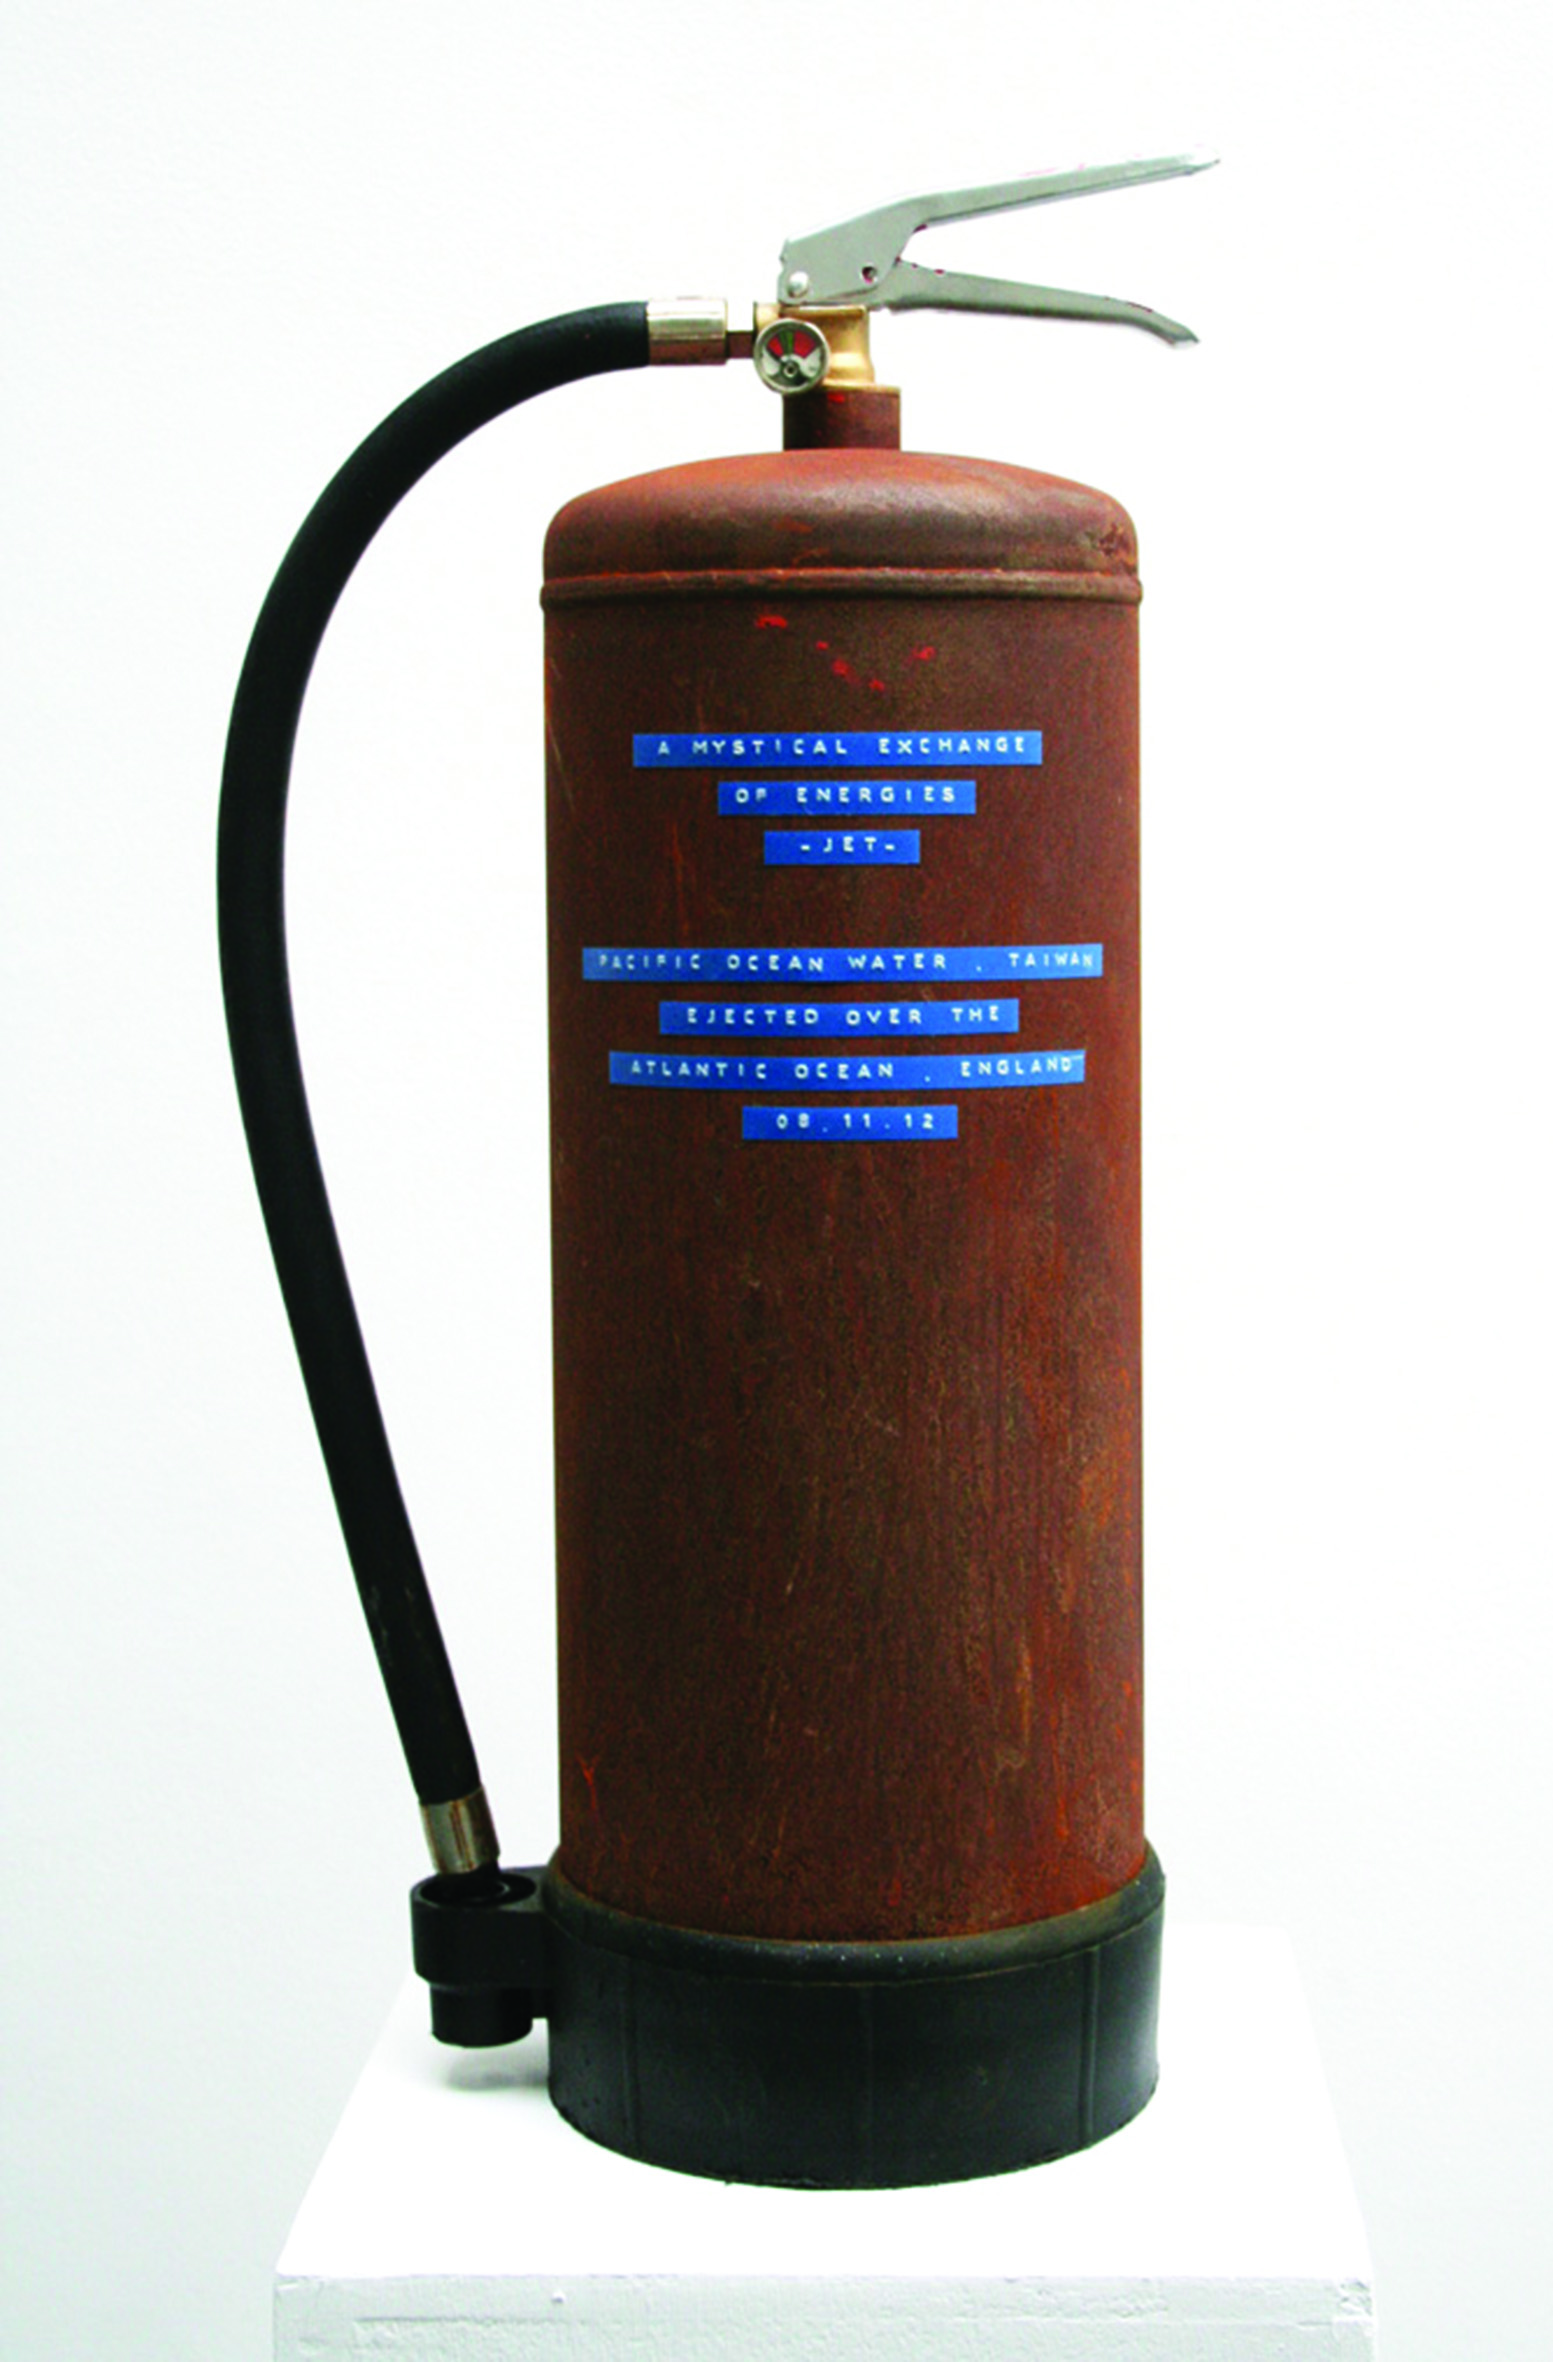 jet spray installation image 2 print.jpg